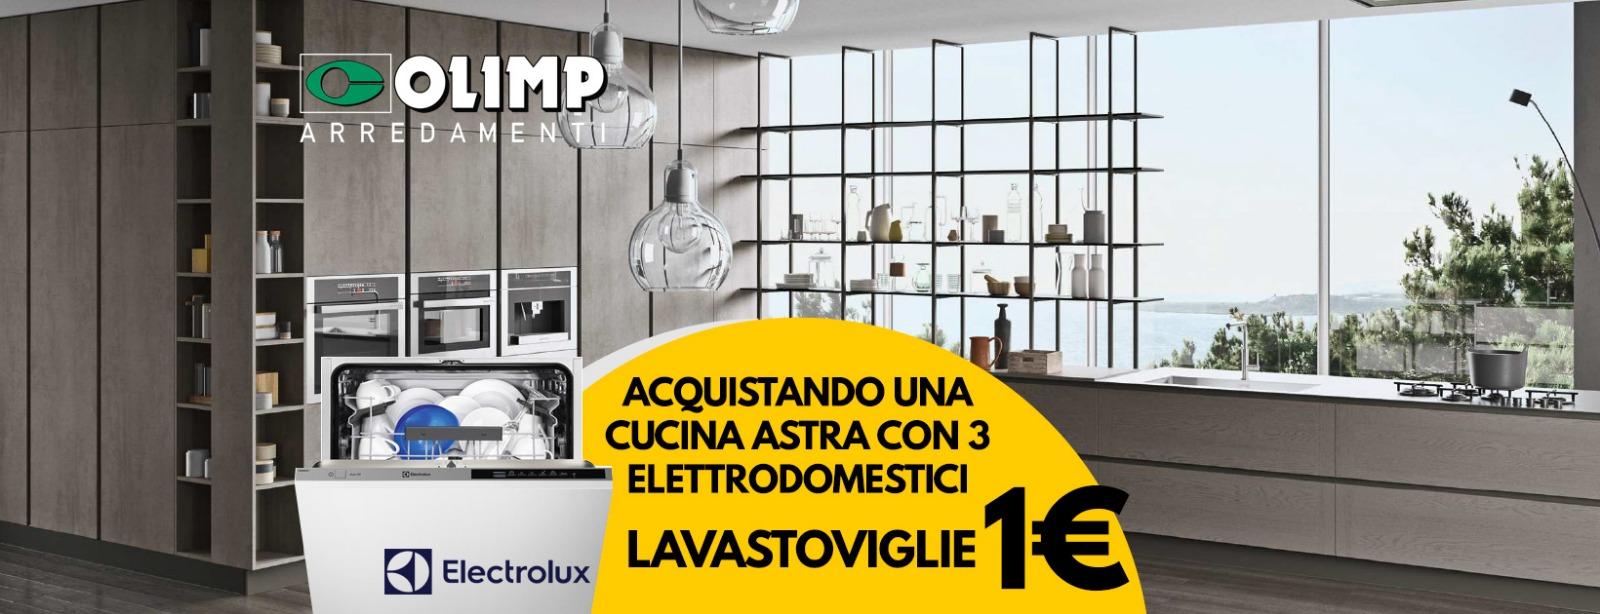 nuova promo olimp electrolux lavastoviglie (2)